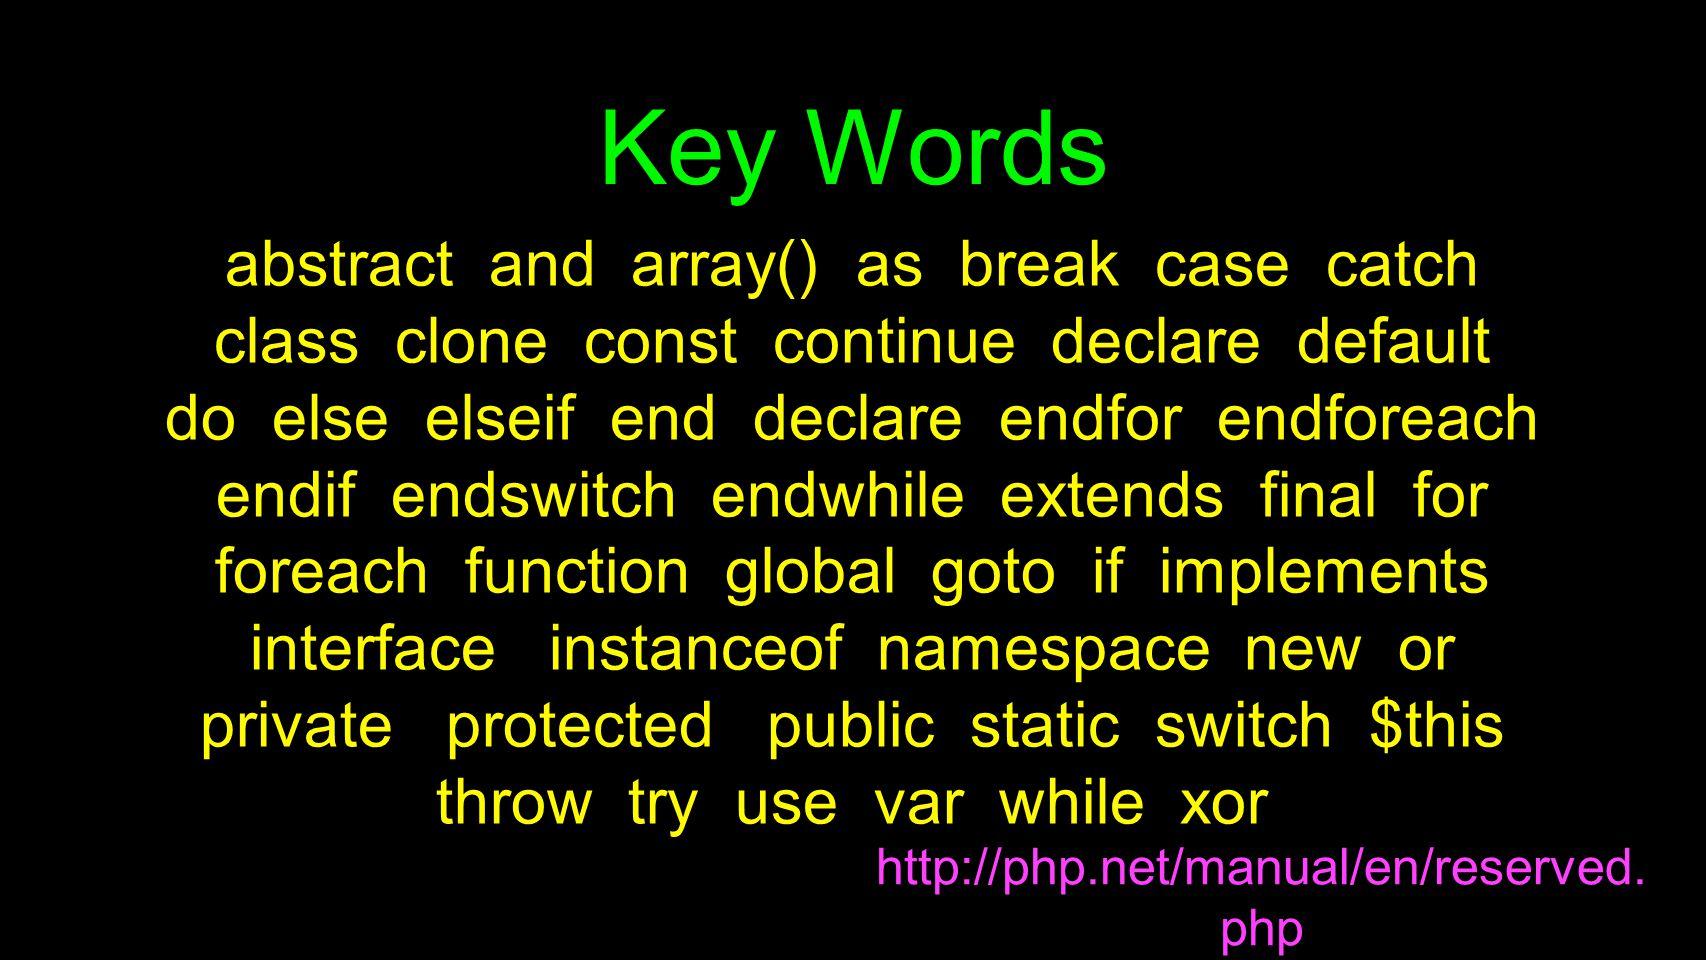 Key Words http://php.net/manual/en/reserved.